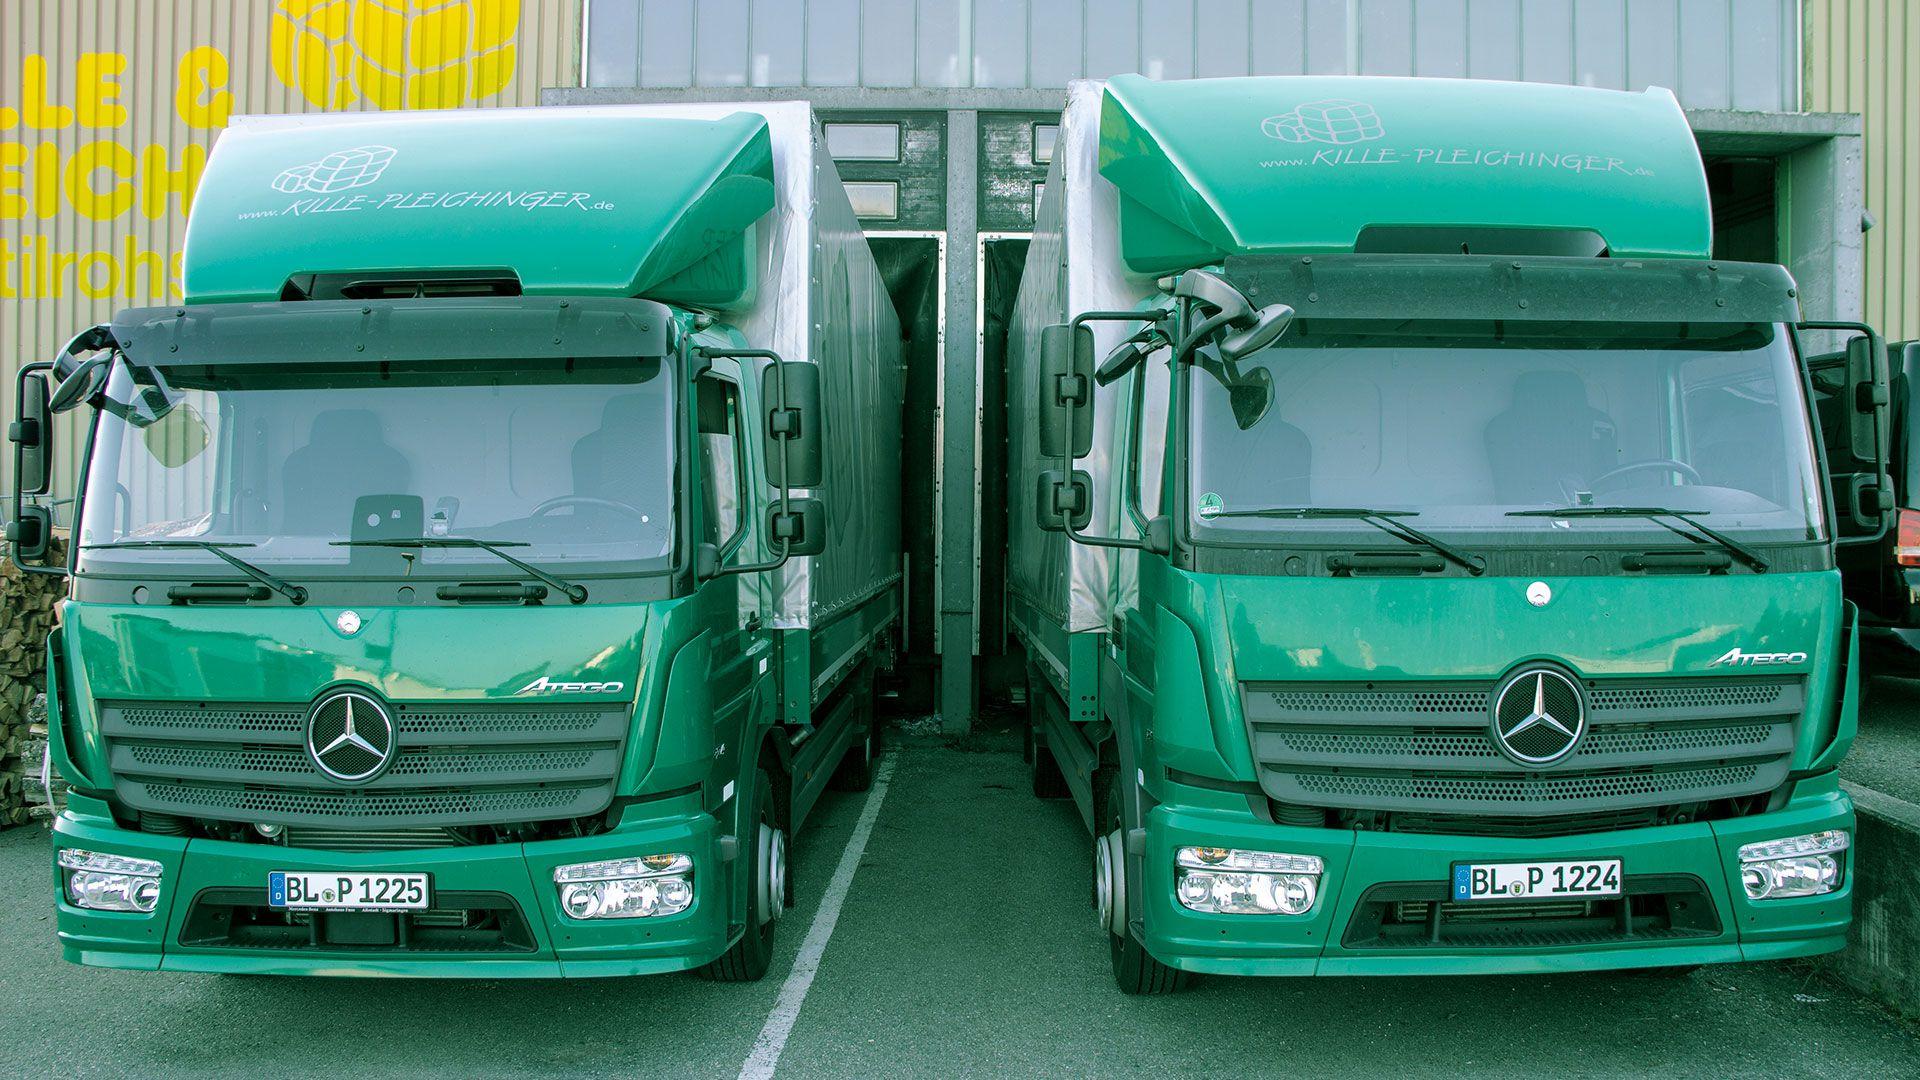 Textilrecycling - Kille & Pleichinger GmbH & Co. KG